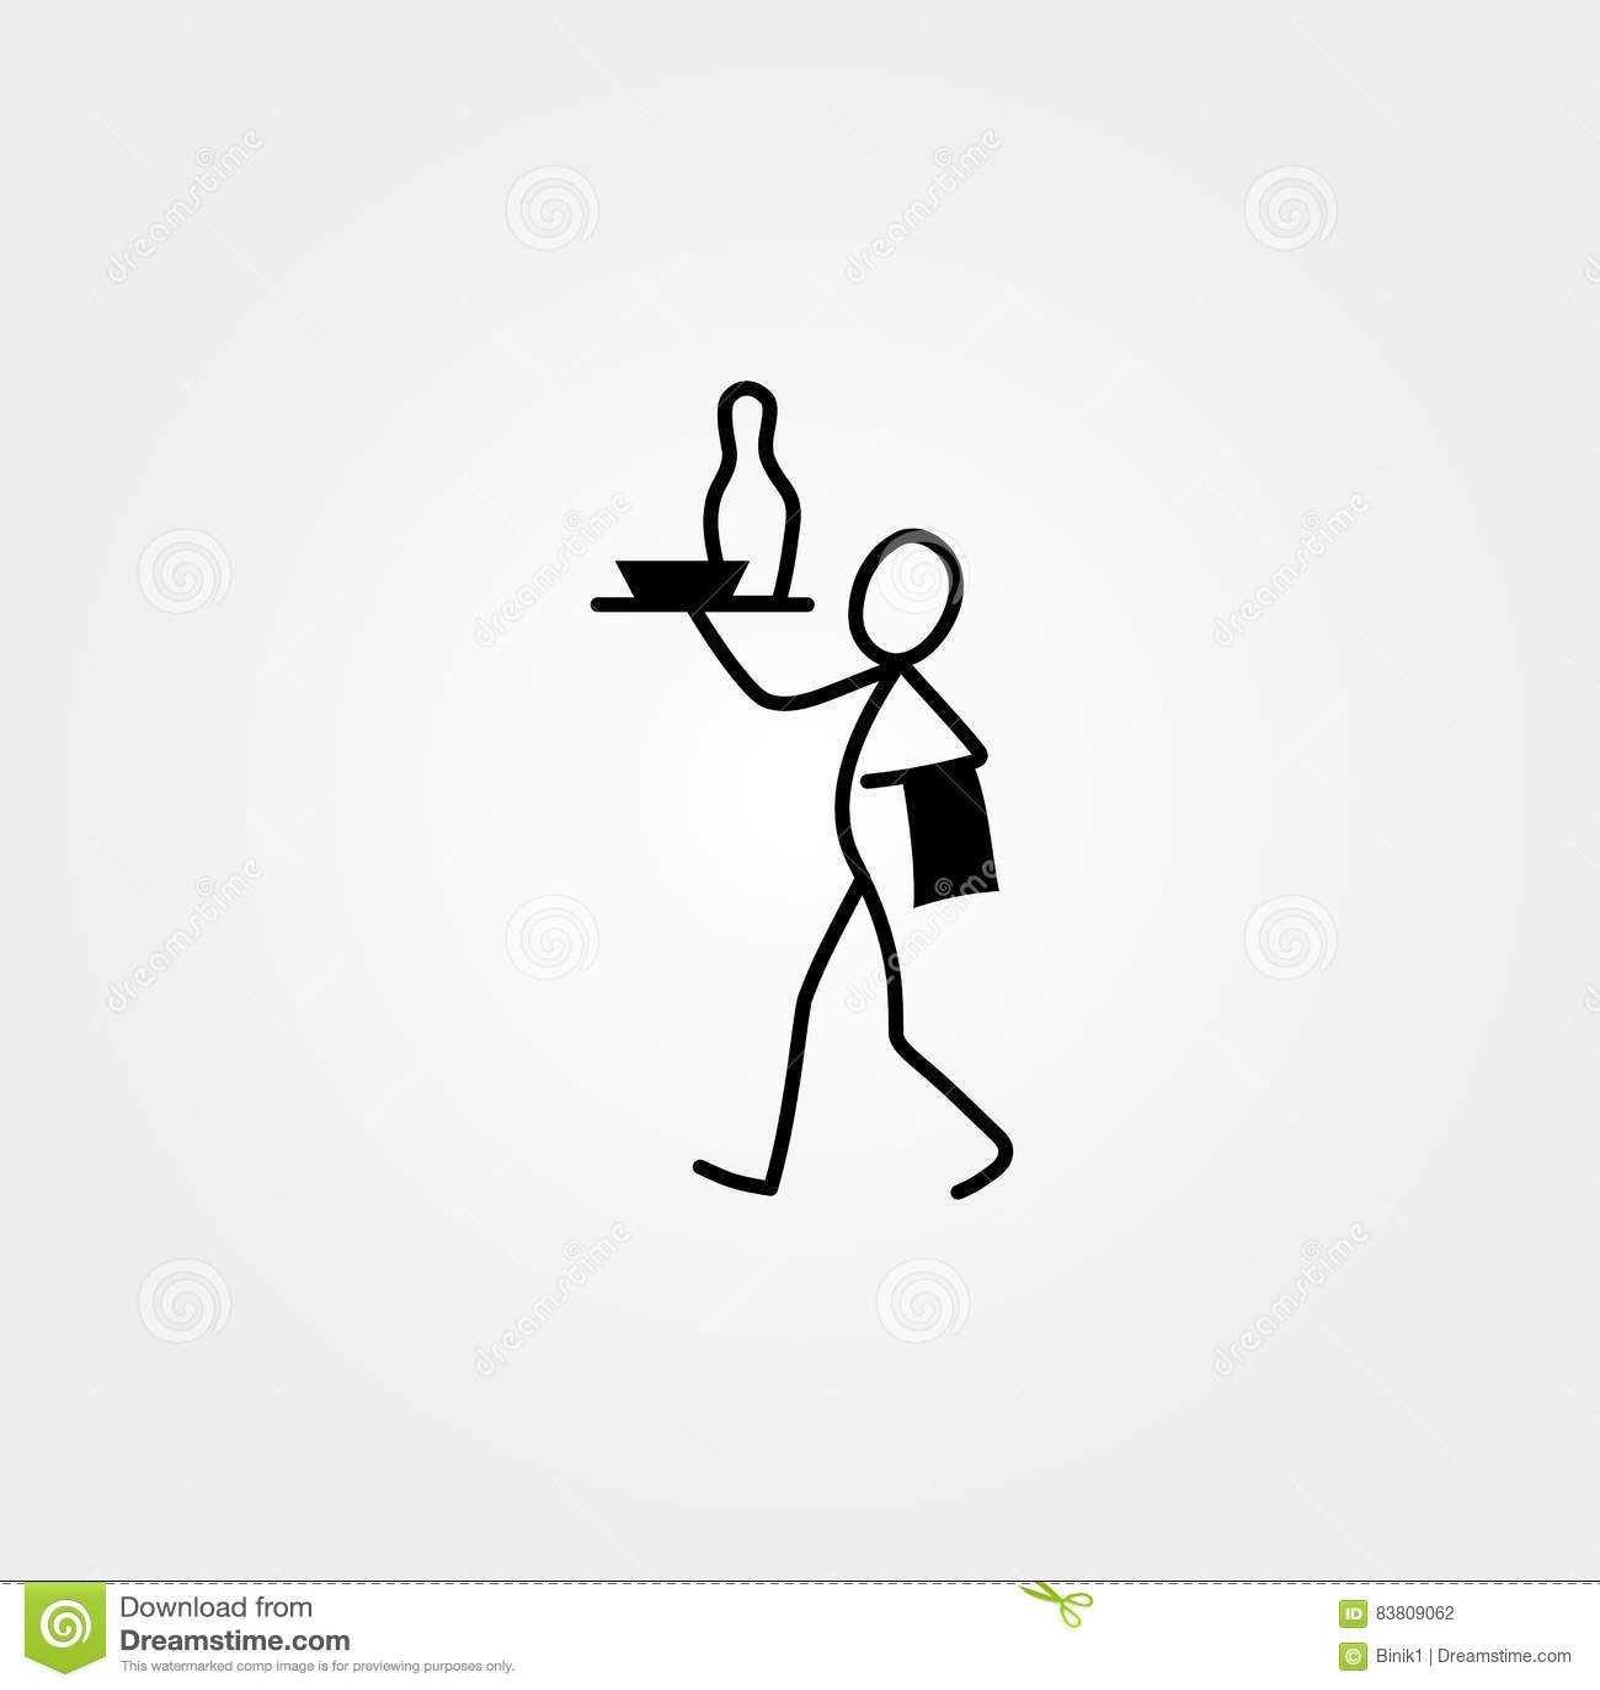 Restaurant Waiter Cook Stick Figure Vector Illustration